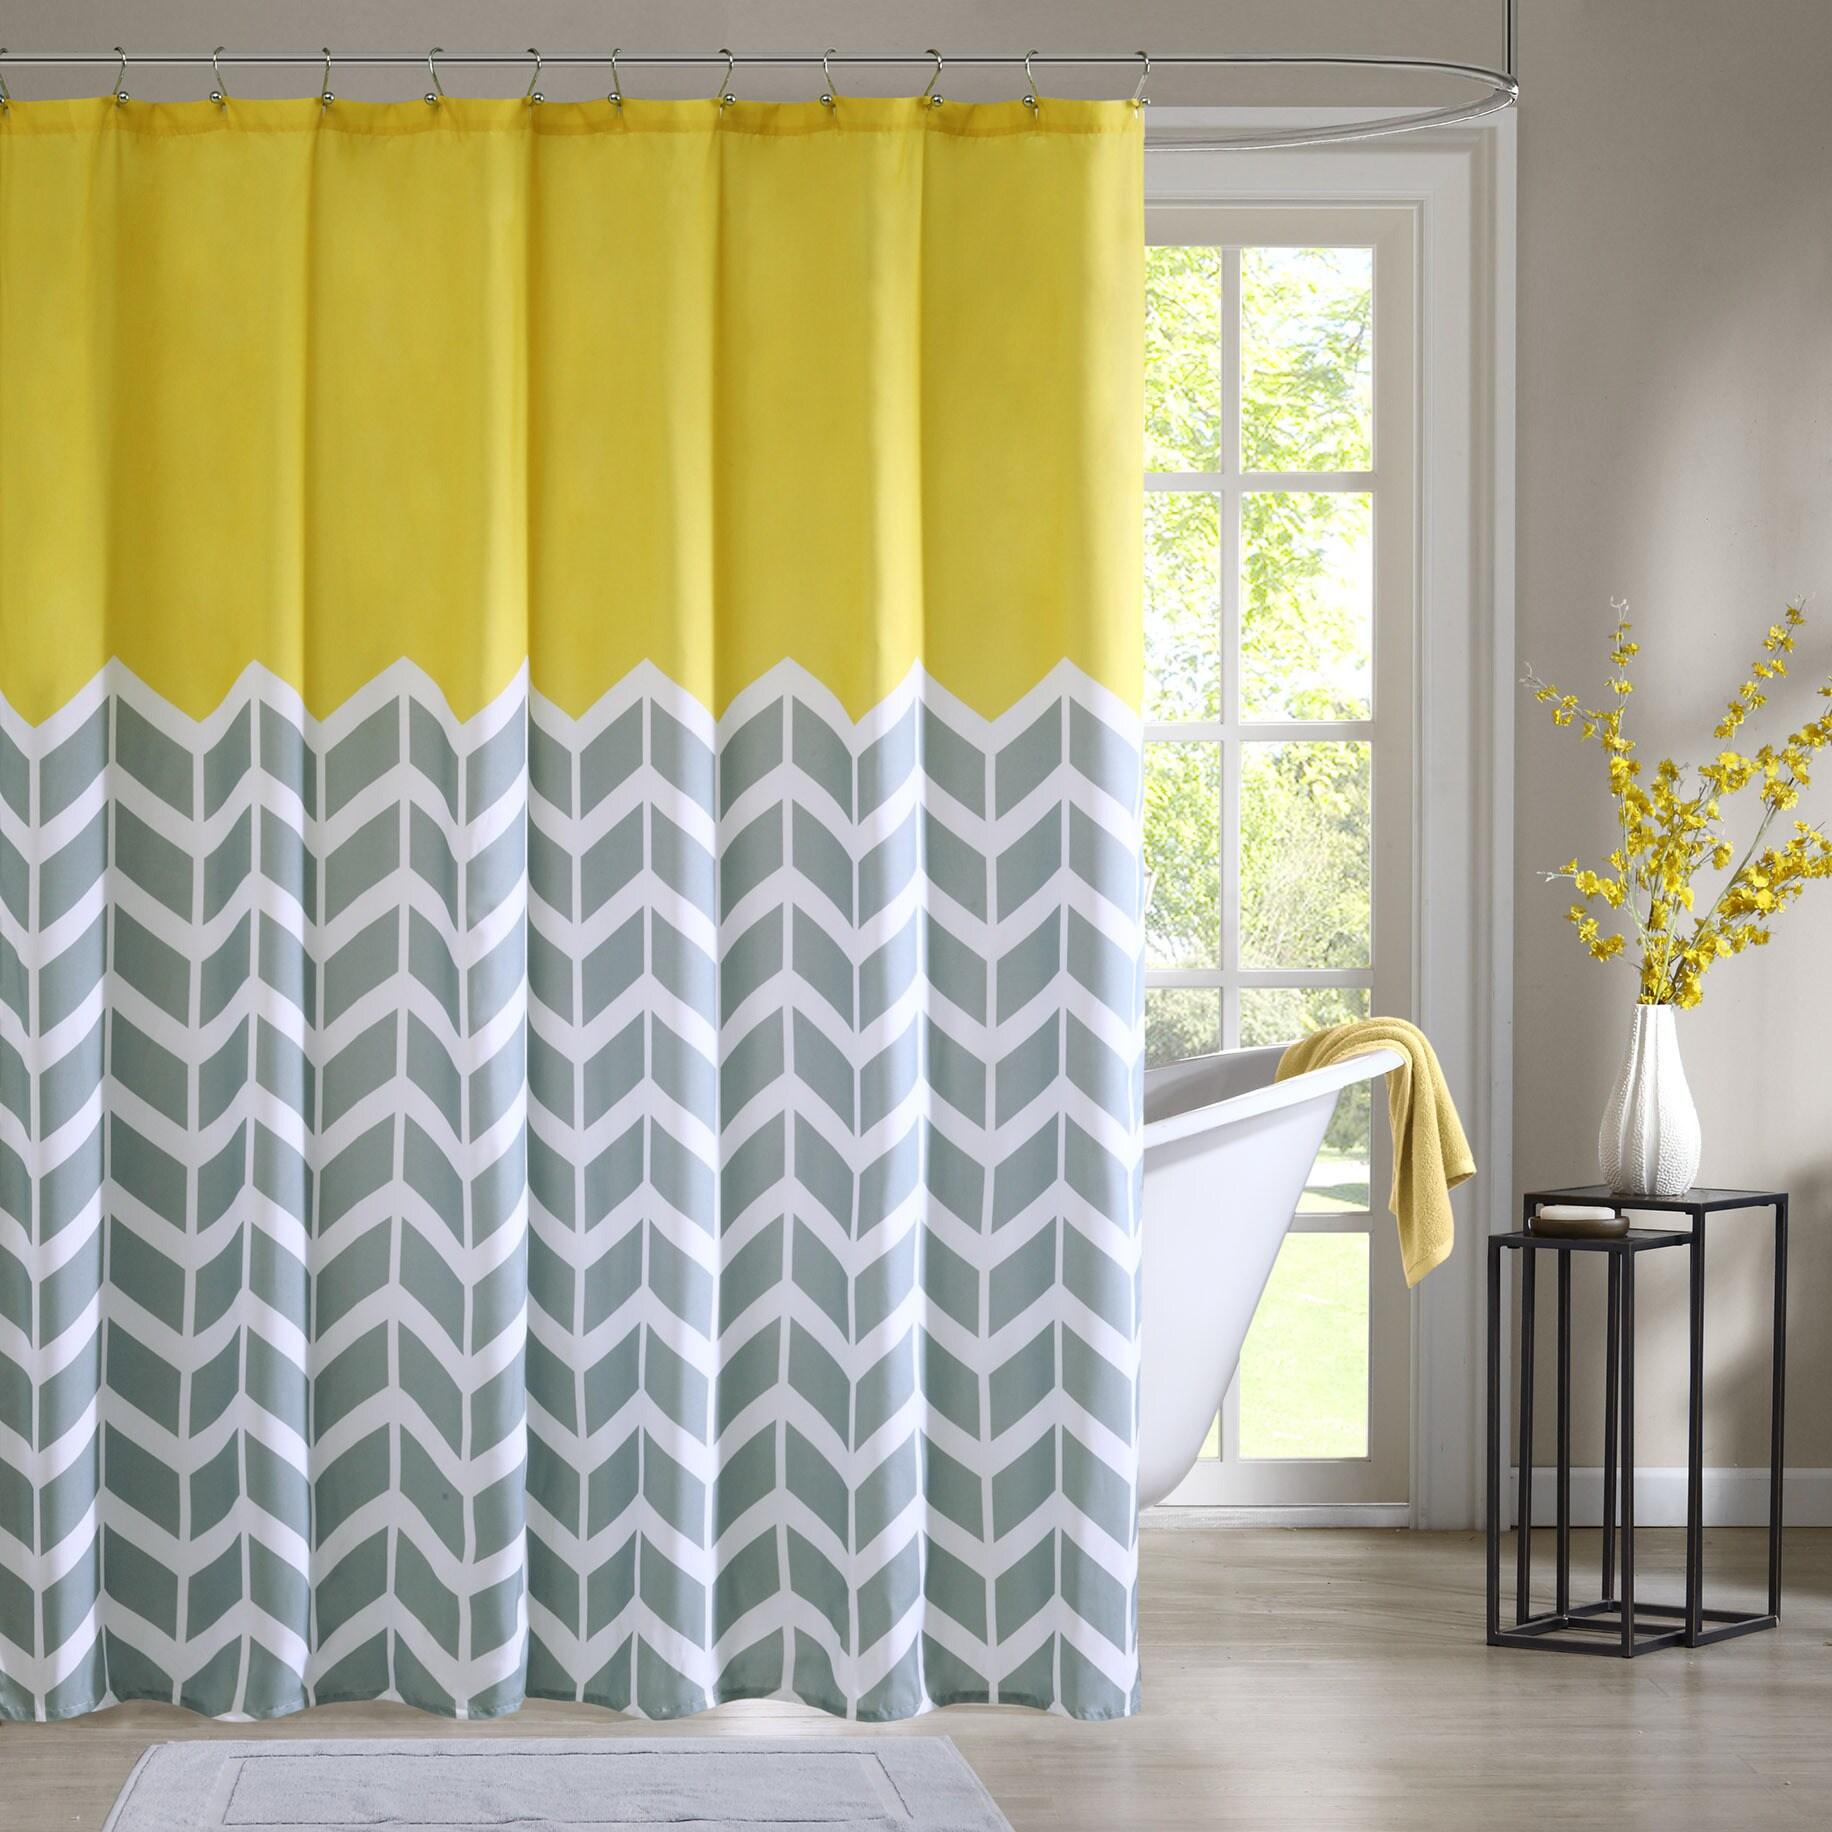 Intelligent Design Elle Printed Shower Curtain - Overstock Shopping ...